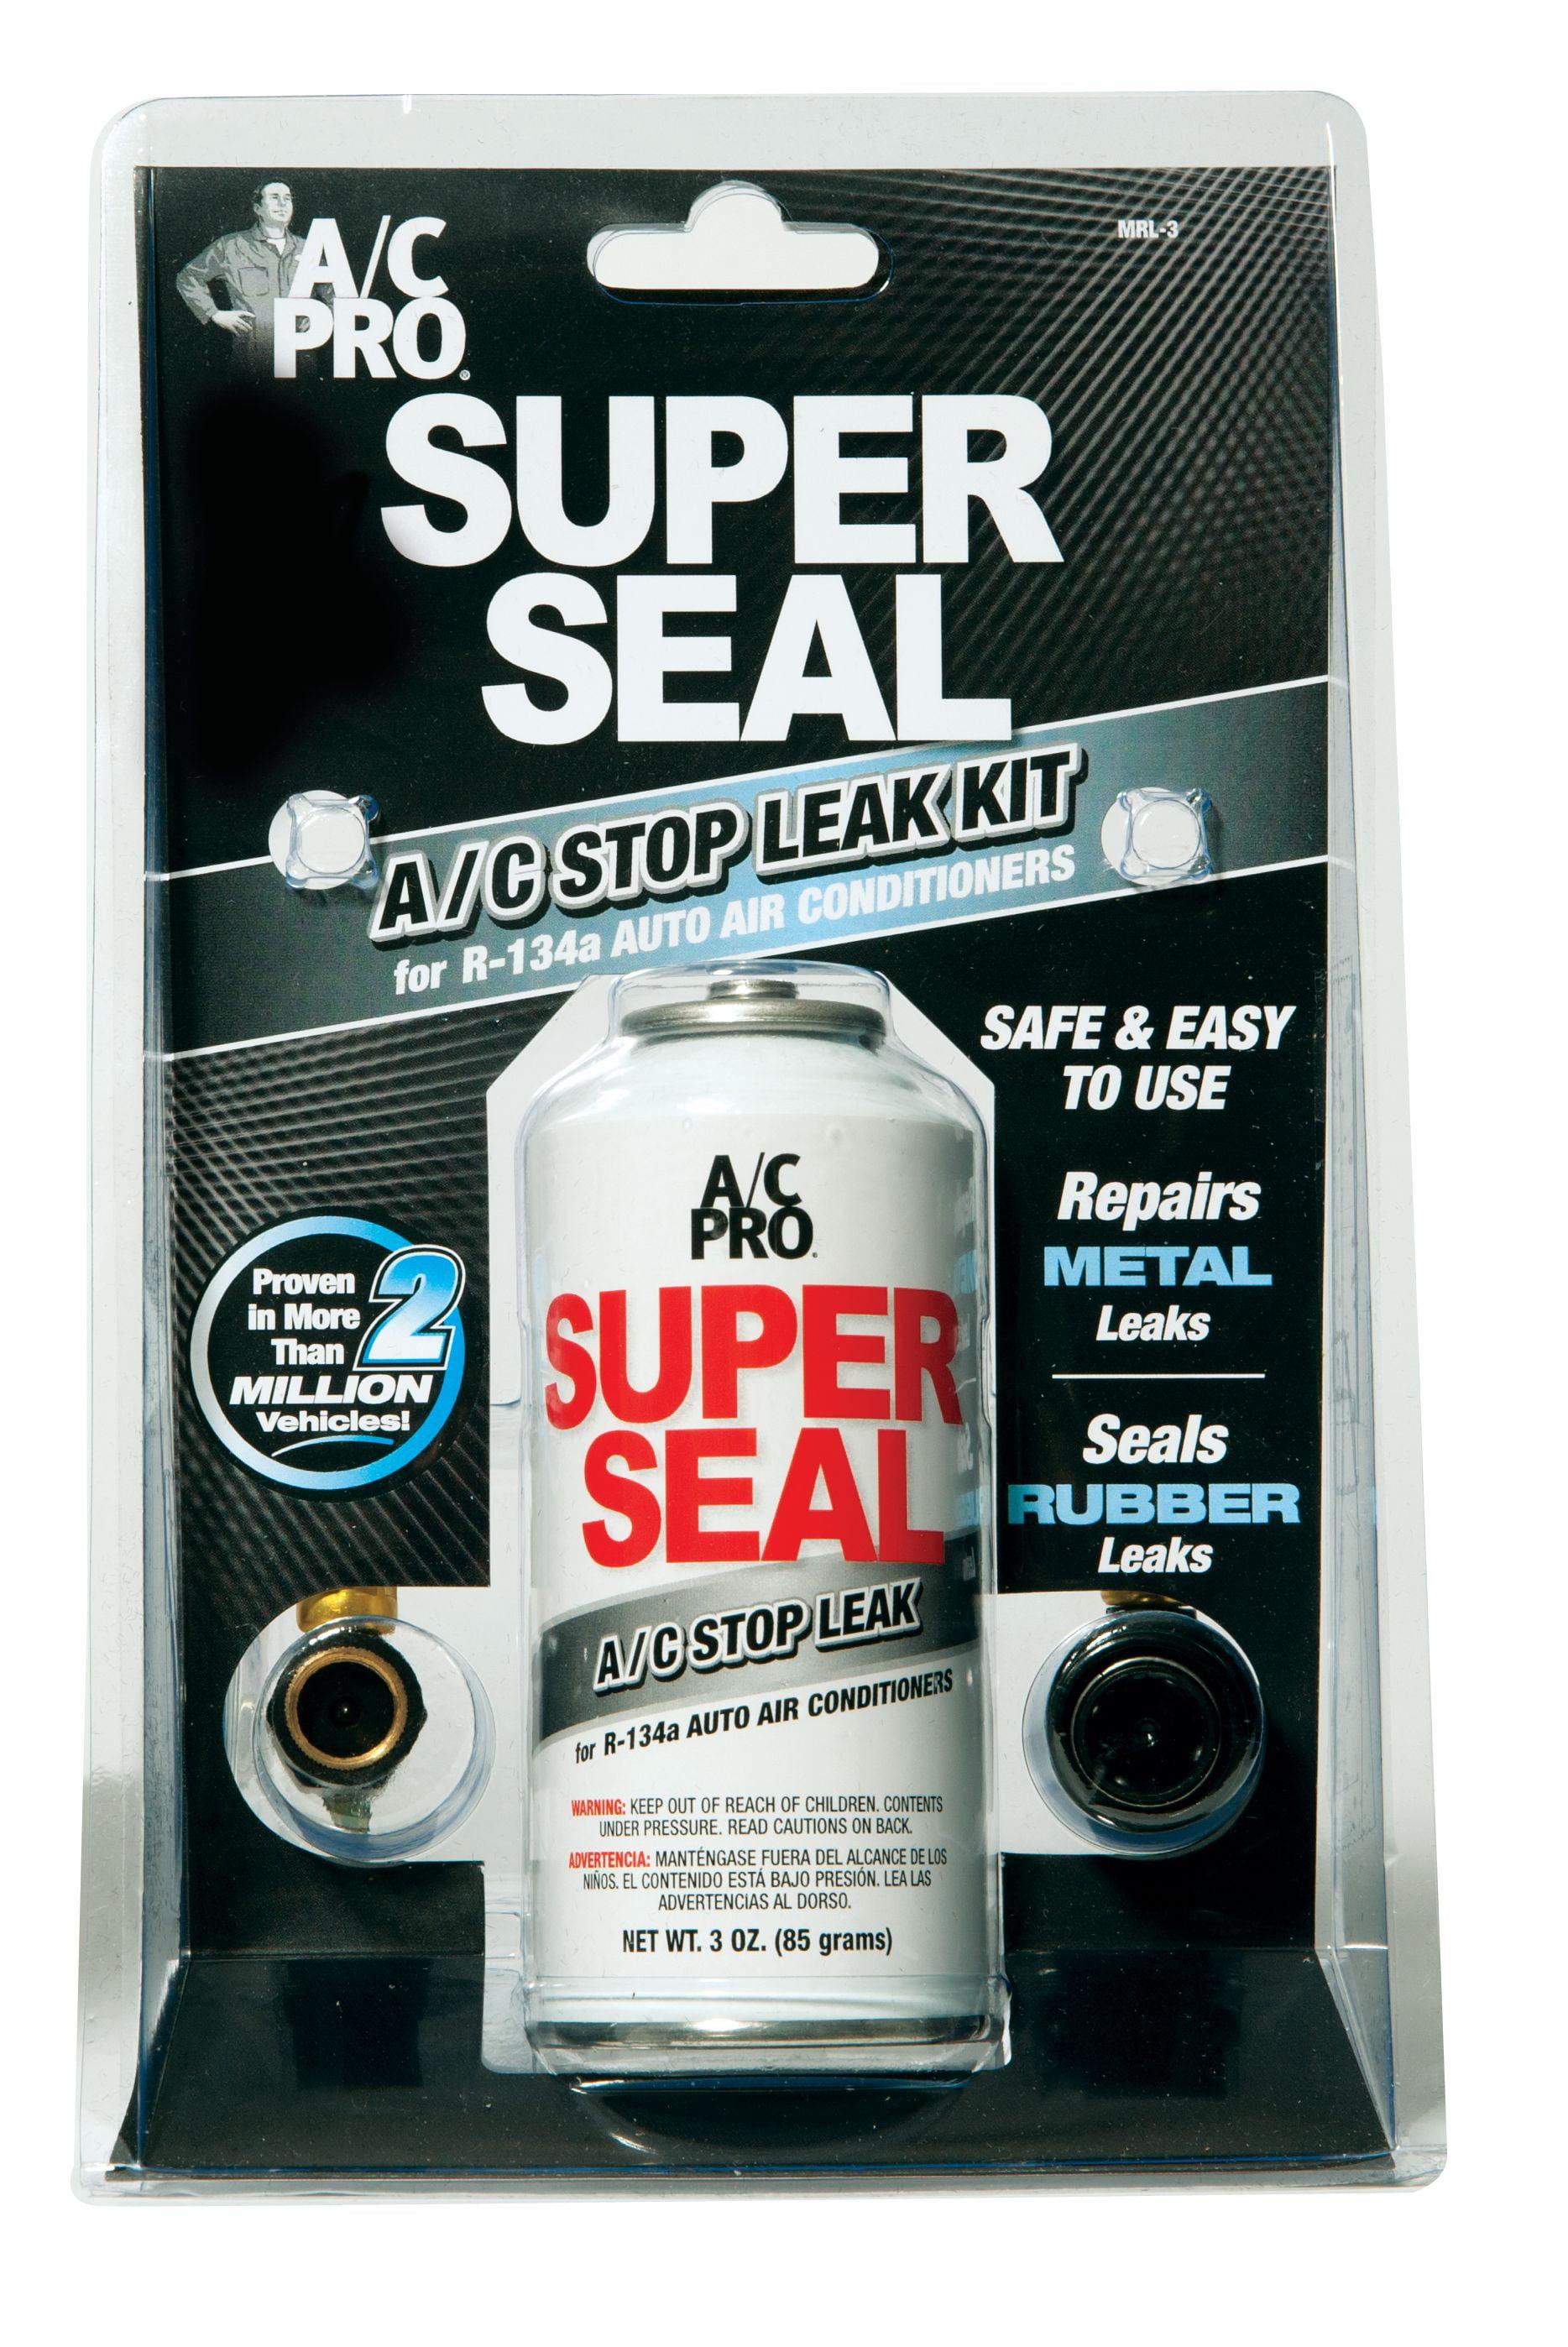 car ac leak sealer  Auto AC Metal and Rubber Leak Sealer - Walmart.com